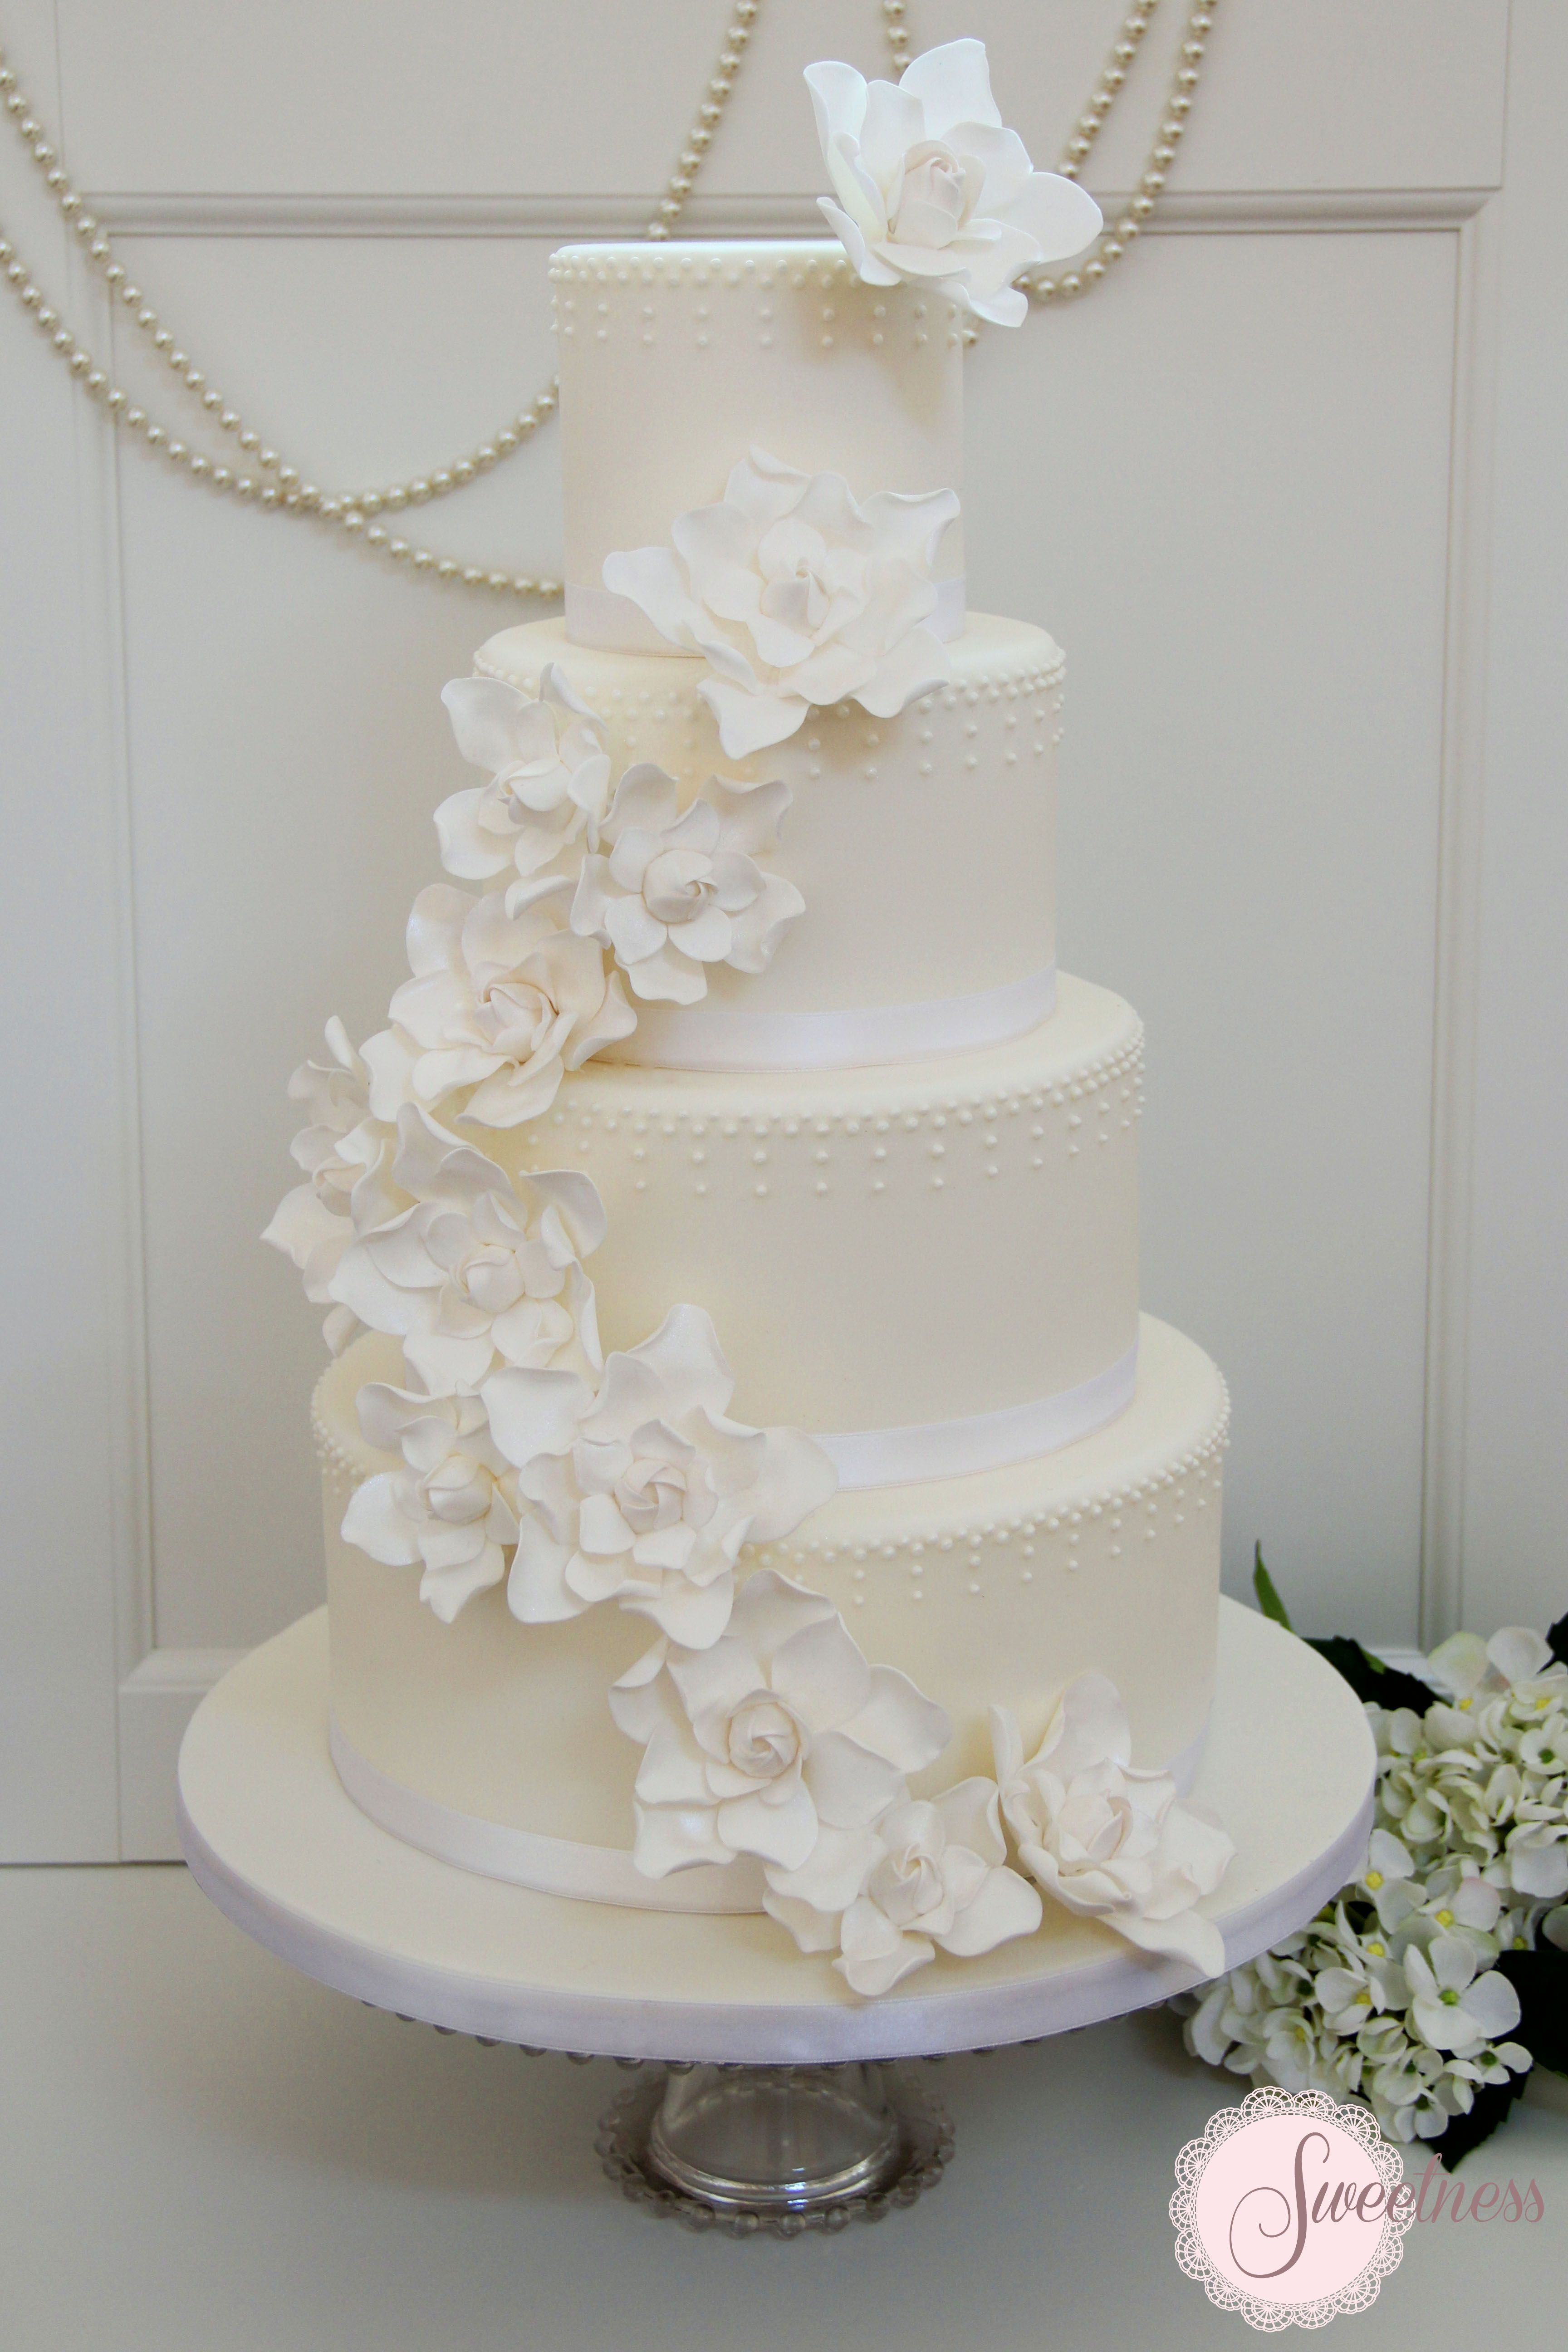 Gardenia wedding flowers great gatsby wedding cake white gardenia wedding flowers great gatsby wedding cake white wedding cakes london vintage wedding junglespirit Image collections